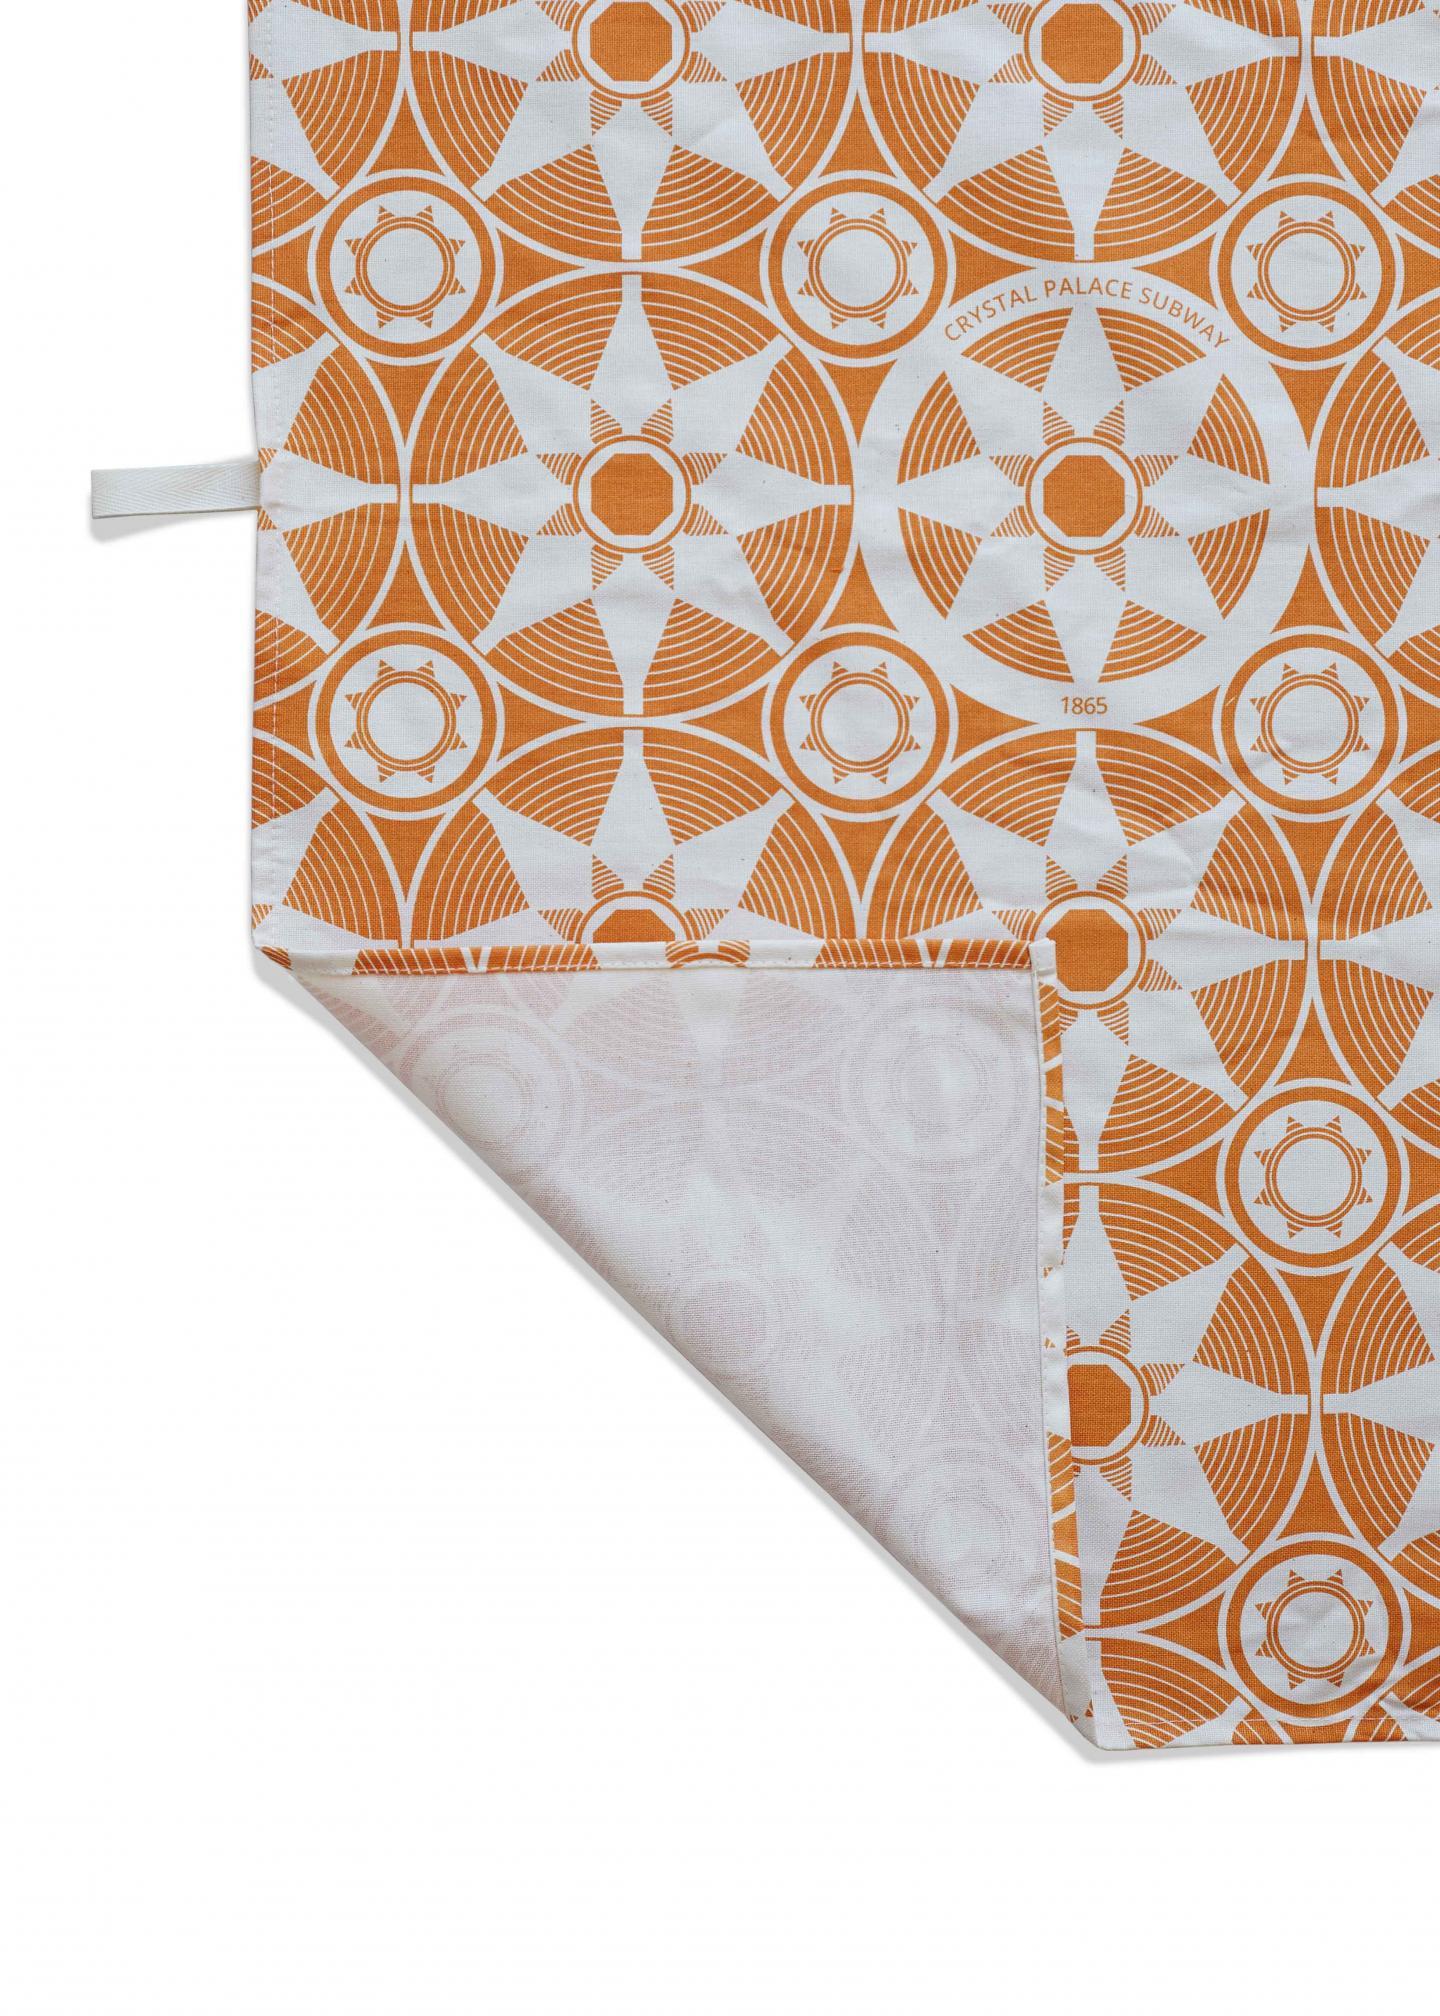 Place in Print Crystal Palace Subway Tea Towel Orange